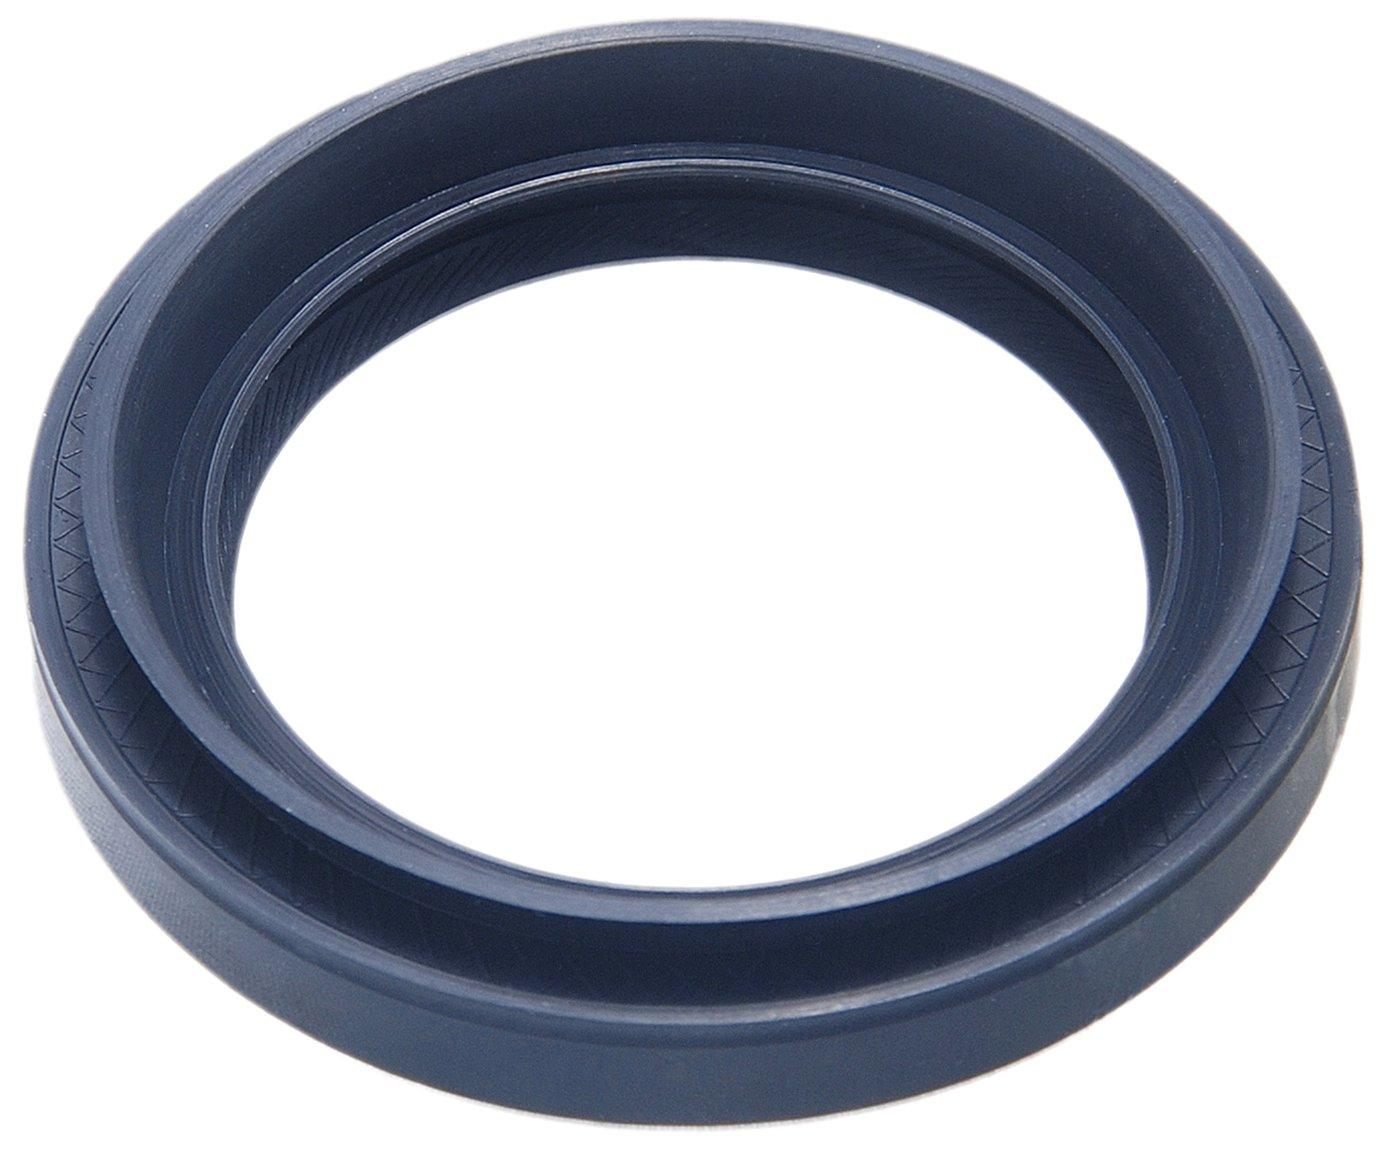 Axle Case Oil Seal 41X56X8X11,4 91205-Pl3-B01 // 91205Pl3B01 For Honda